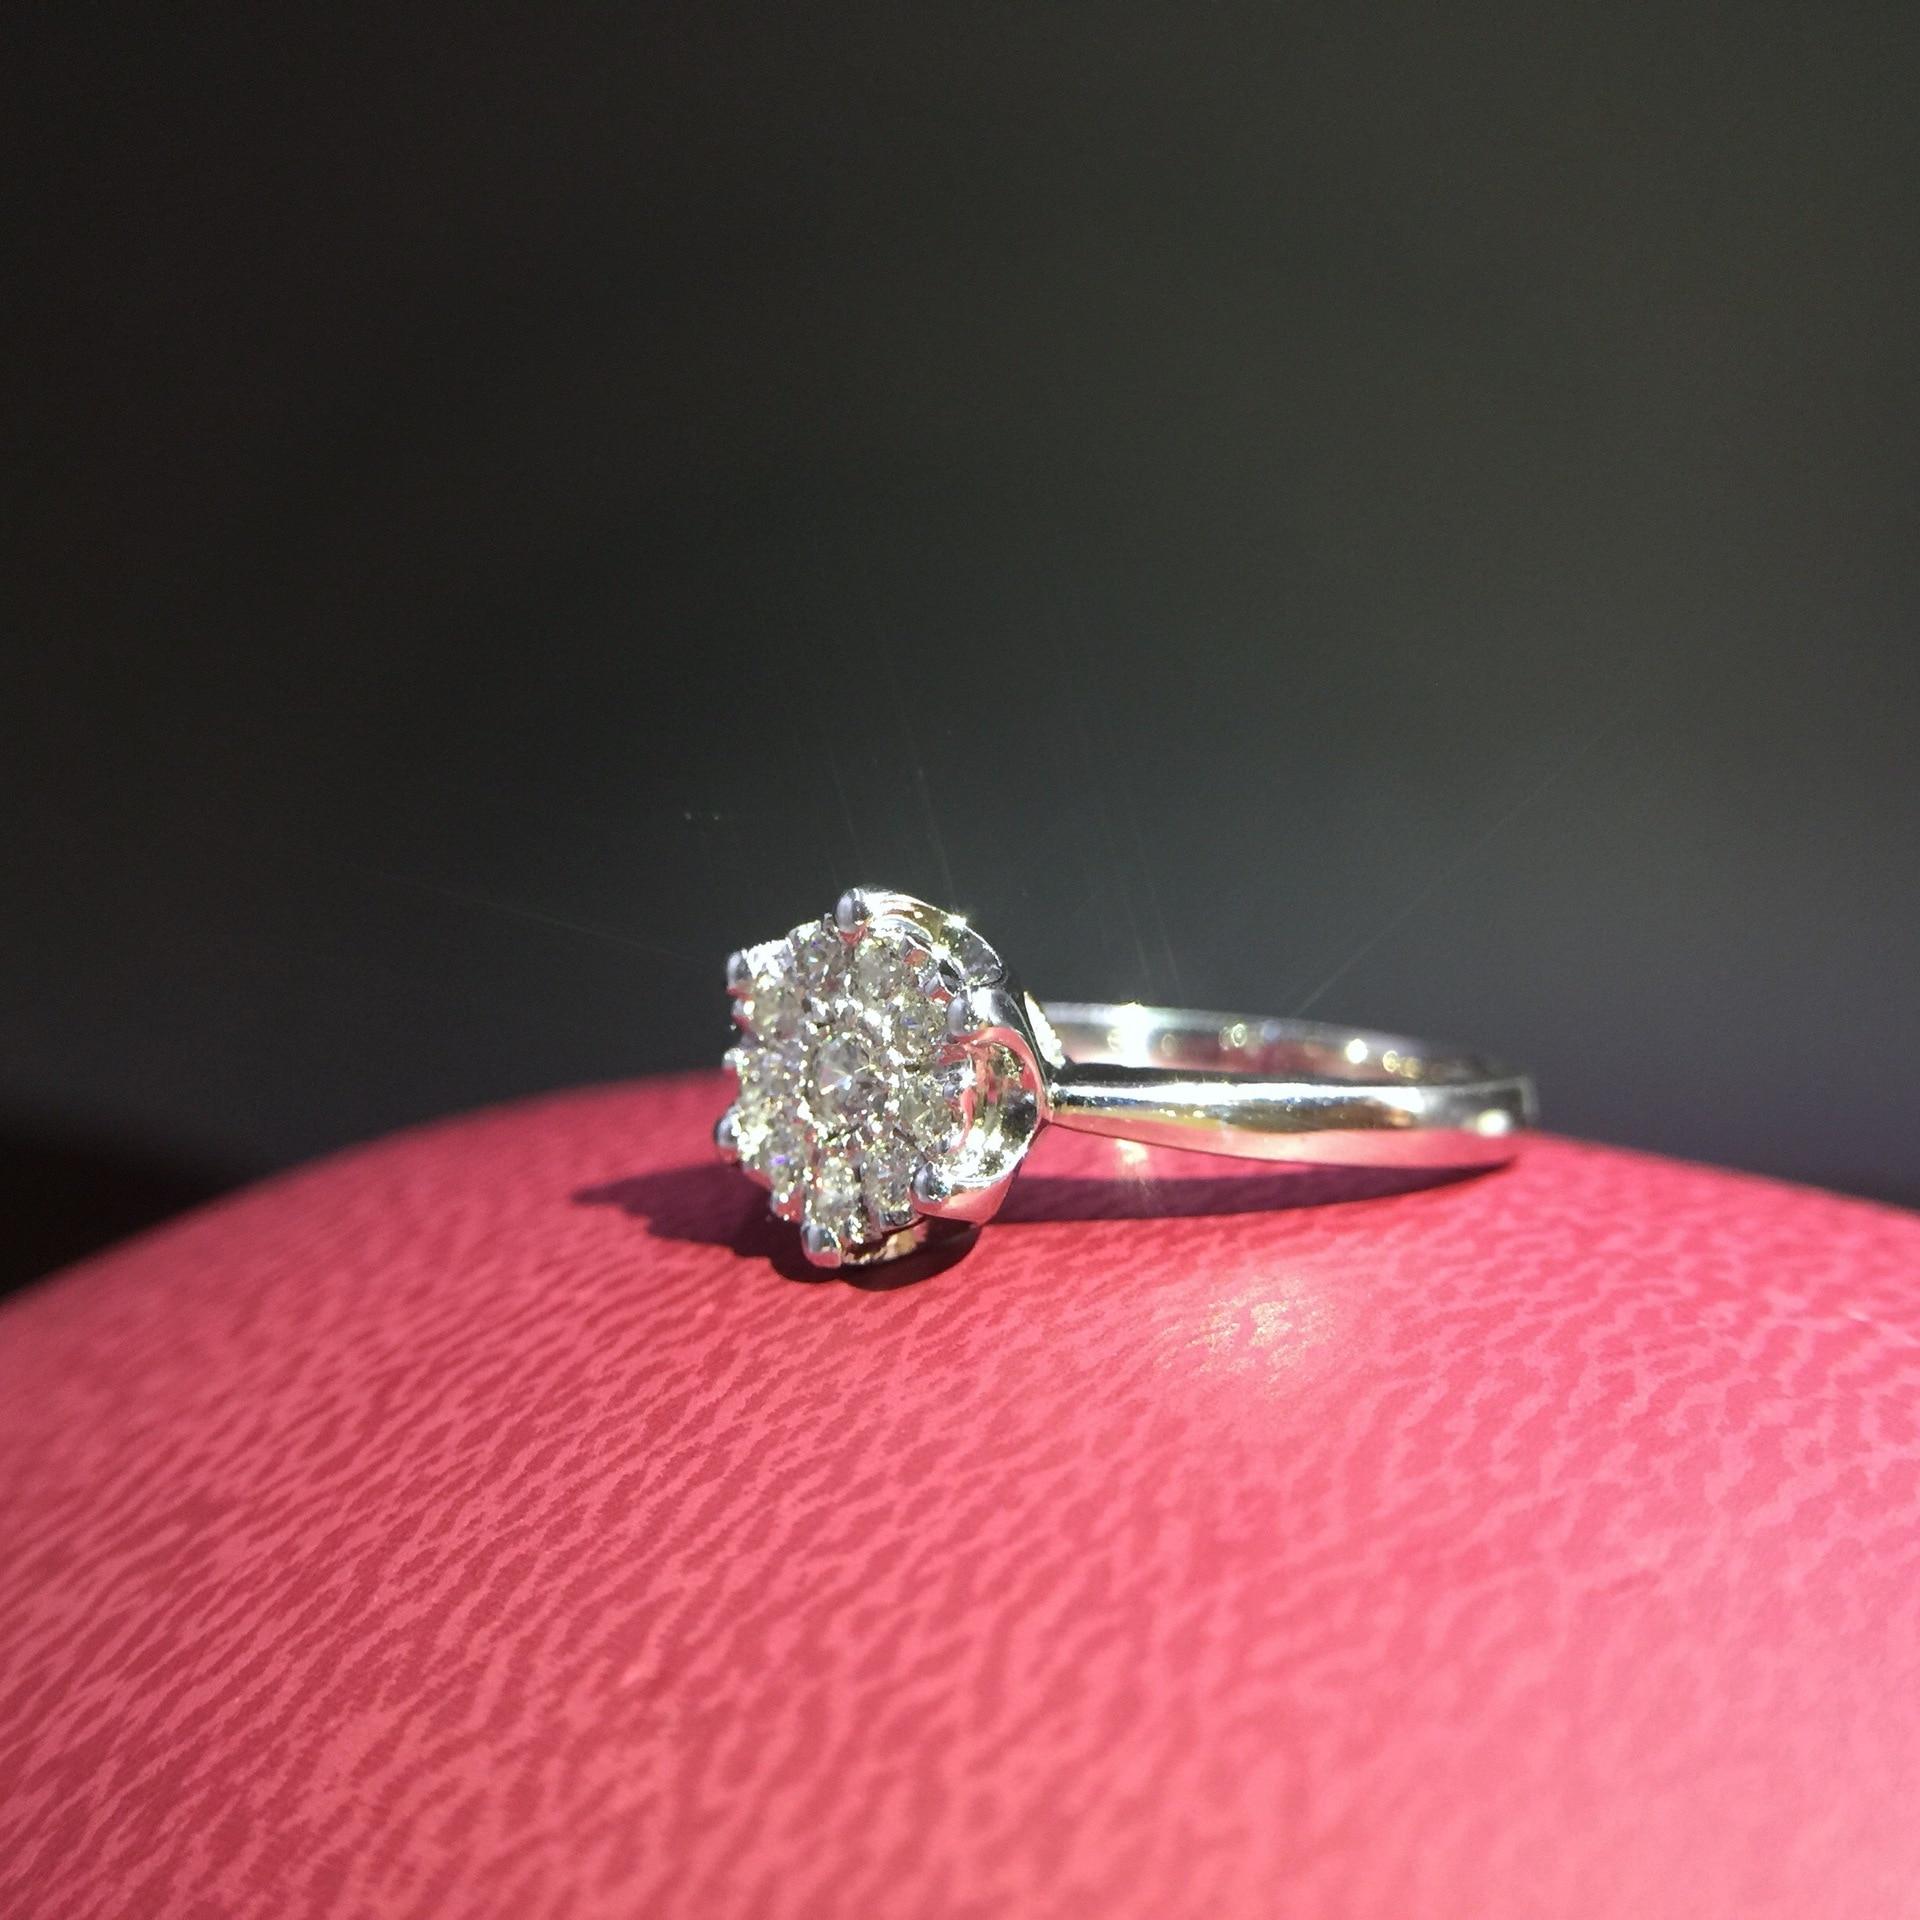 0.5 carat man made diamond jewelry silver lover wedding ring band ...